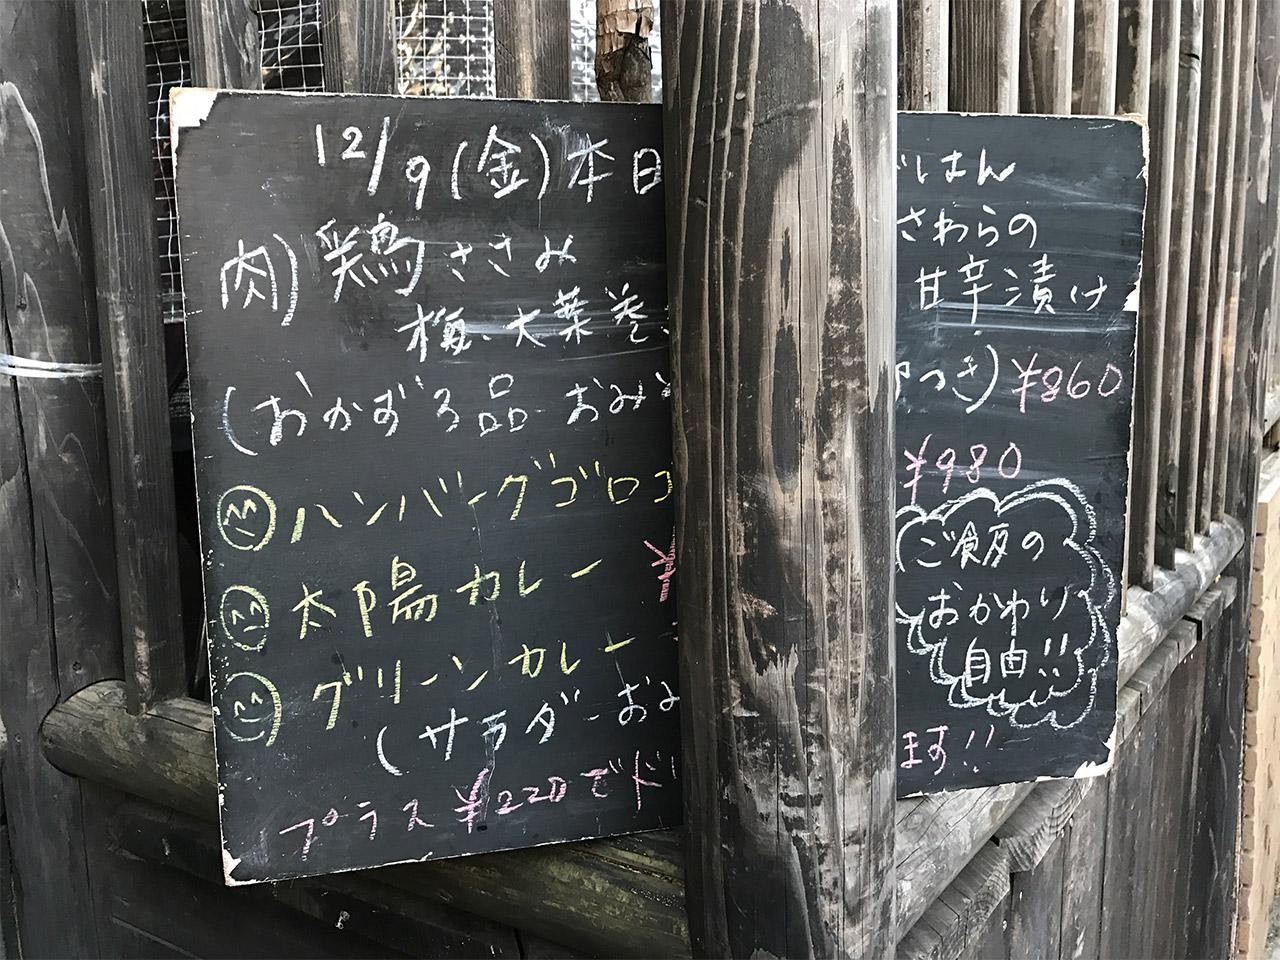 ikejiri-taiyou-kanban